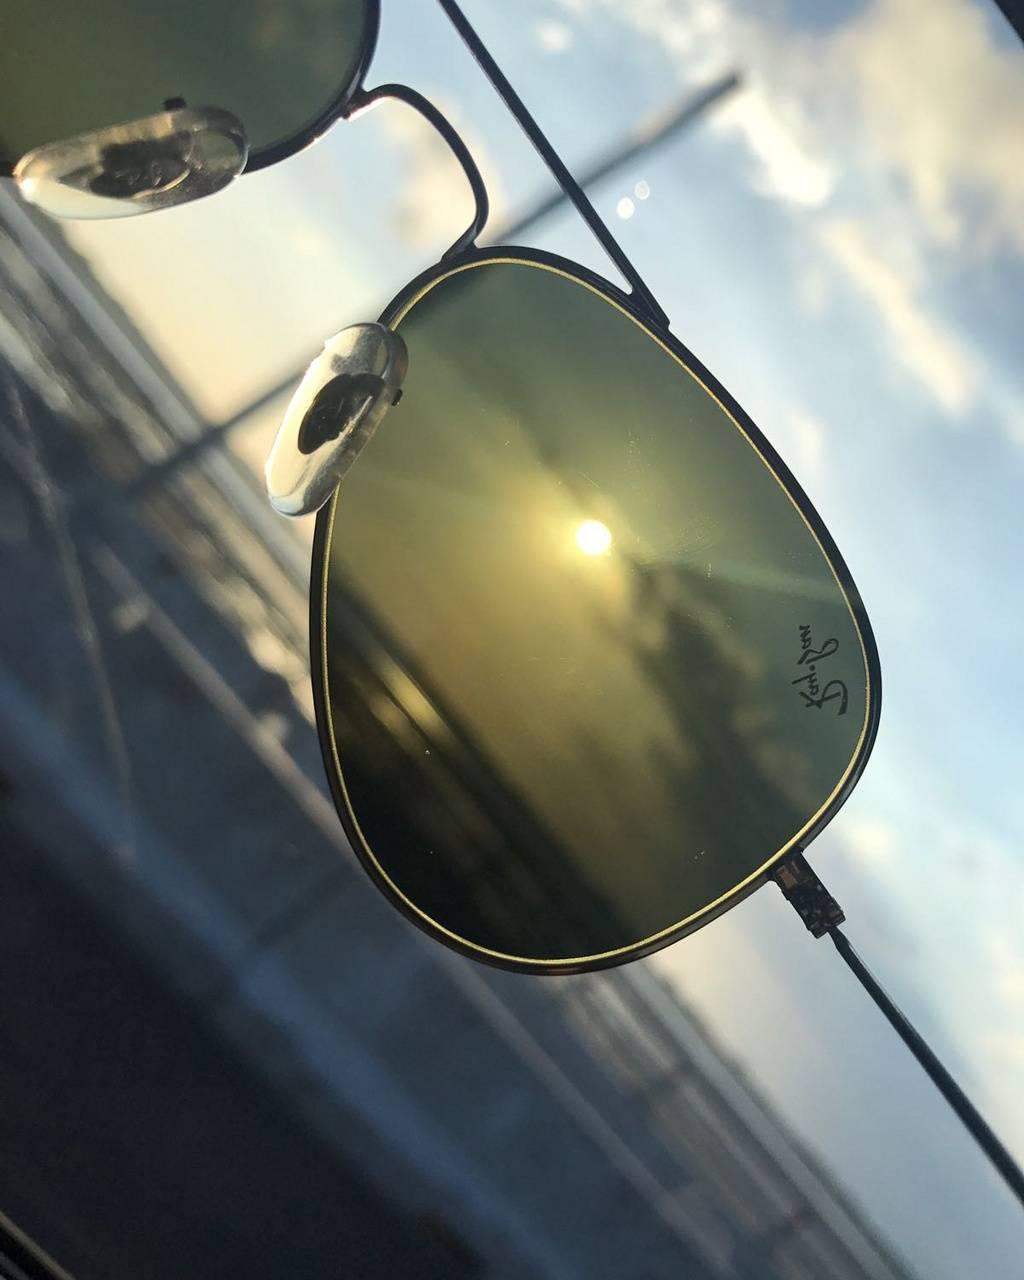 Shades and sun